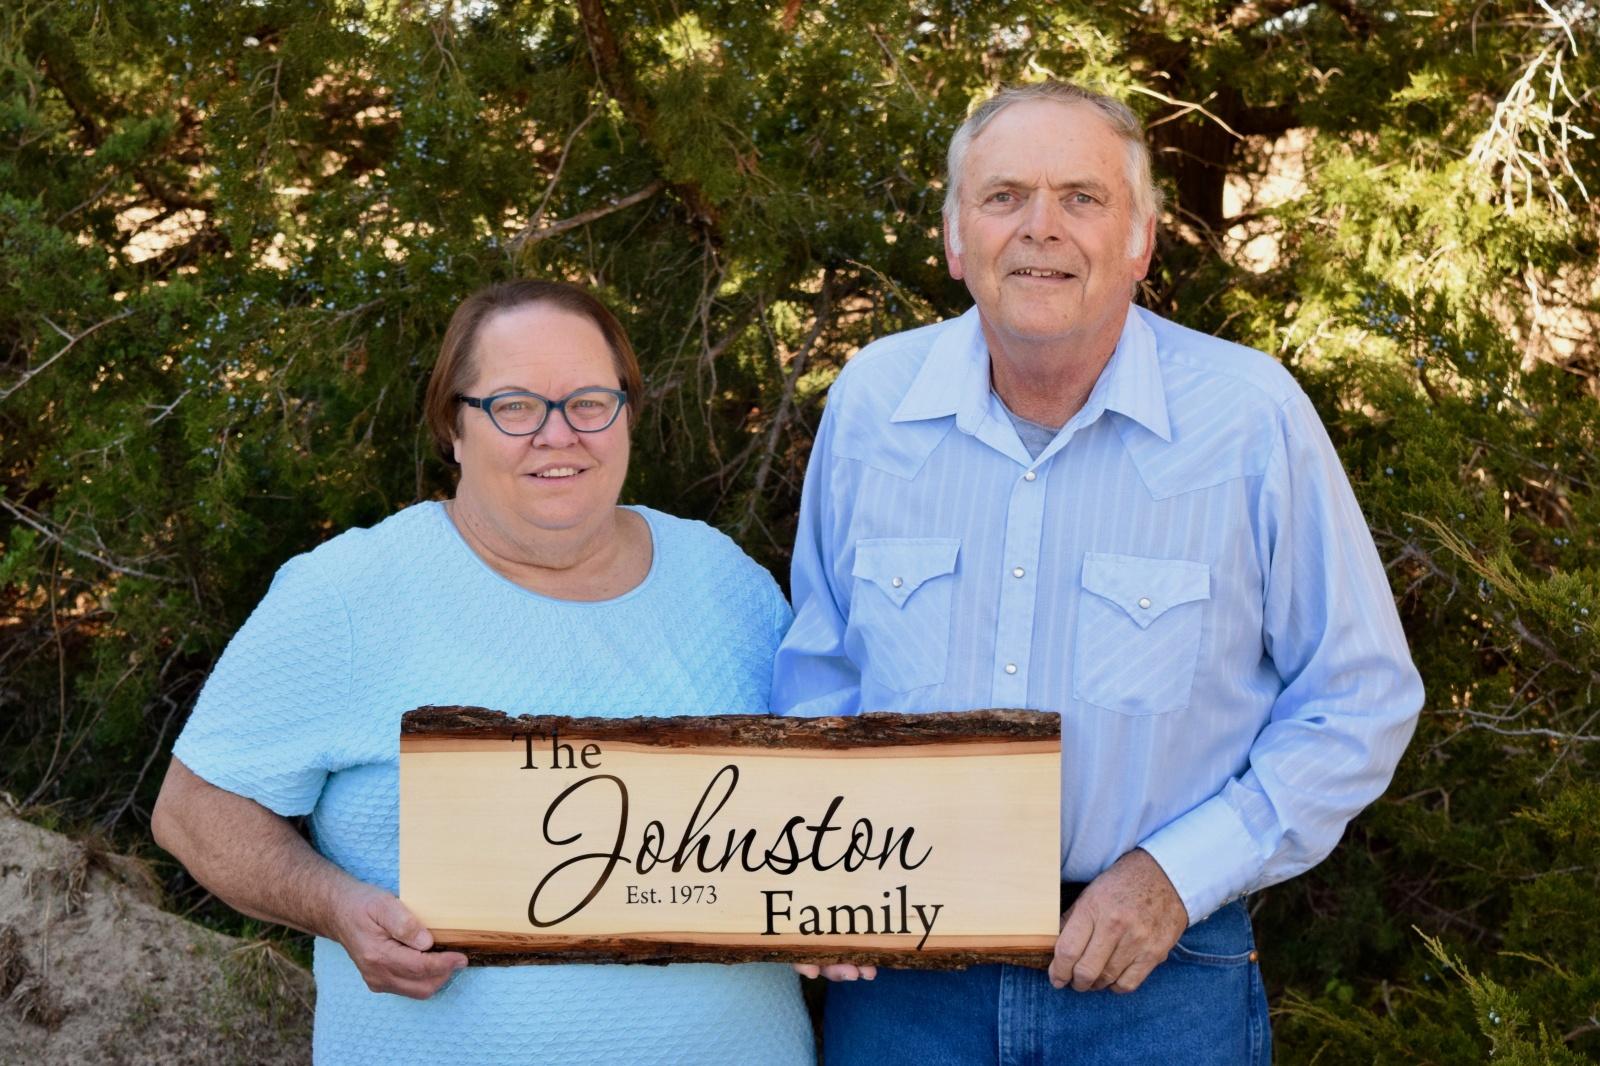 Funeral Services for Ken & Sue Johnston